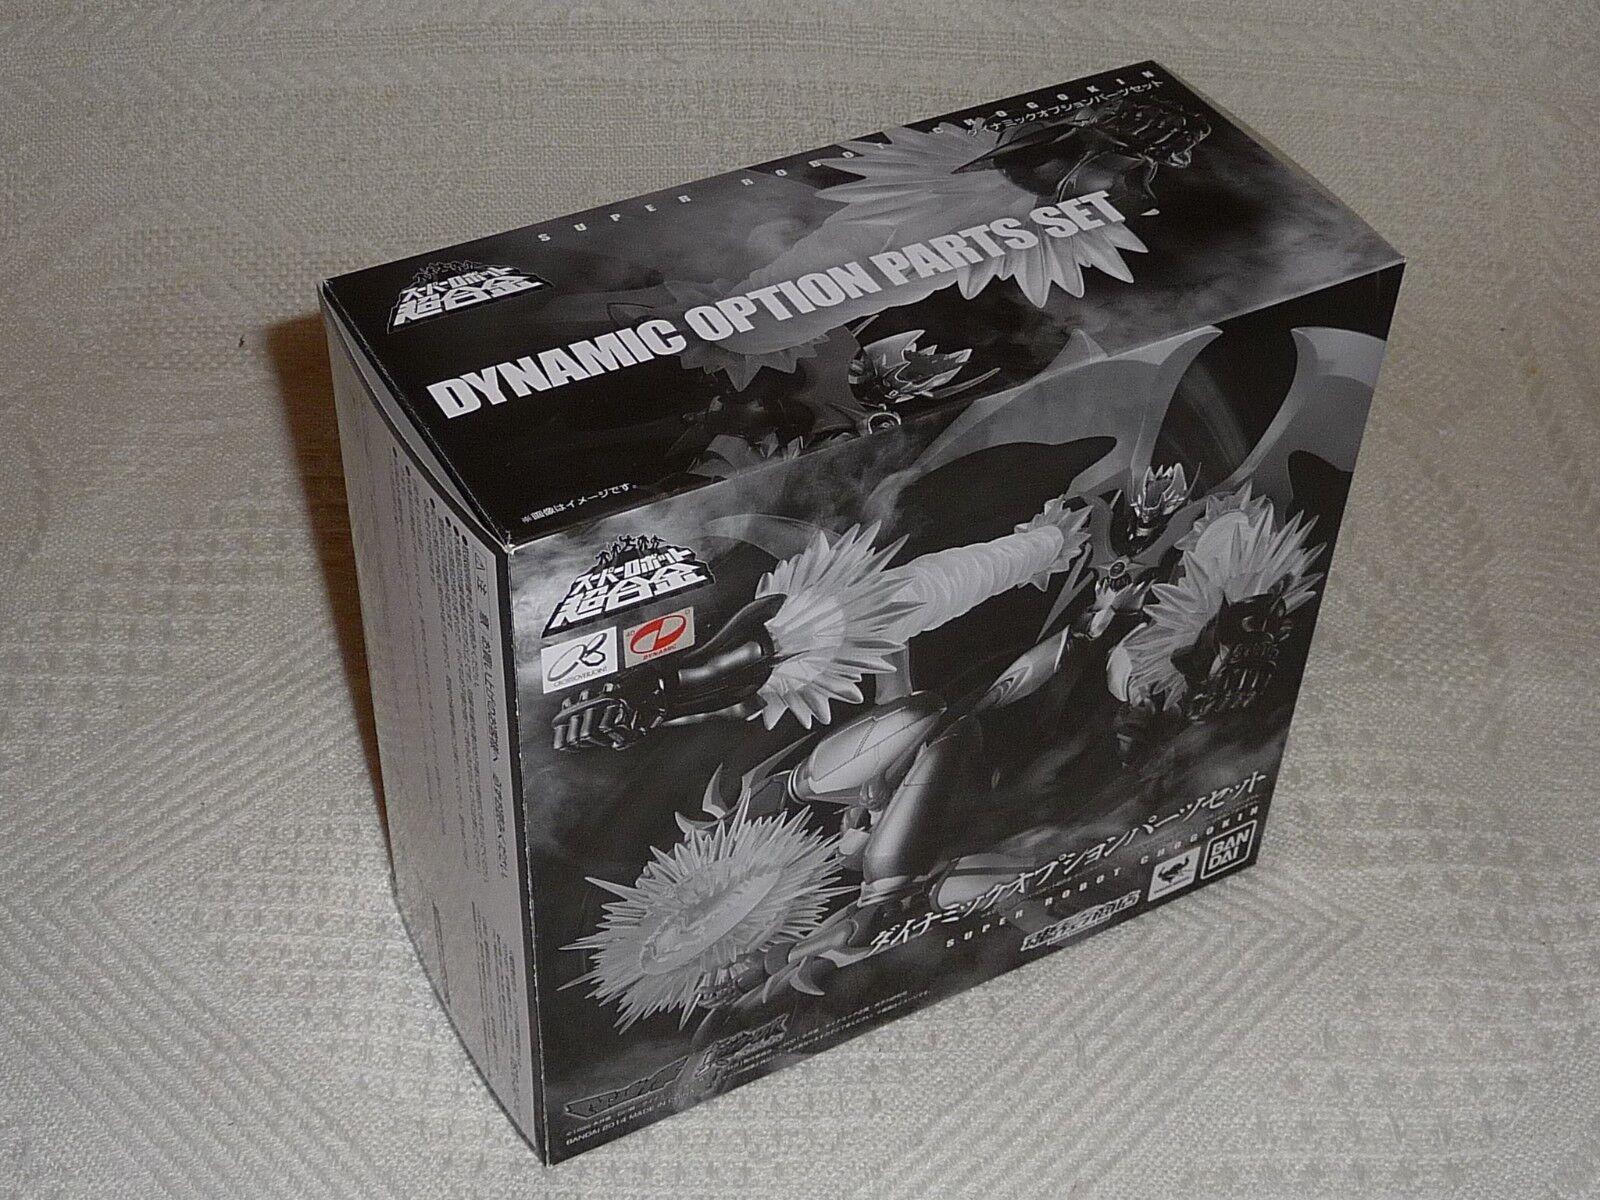 Bandai Tamashii - súper Robot Chogokin - Dynamic Option Parts -  NEW & Sealed